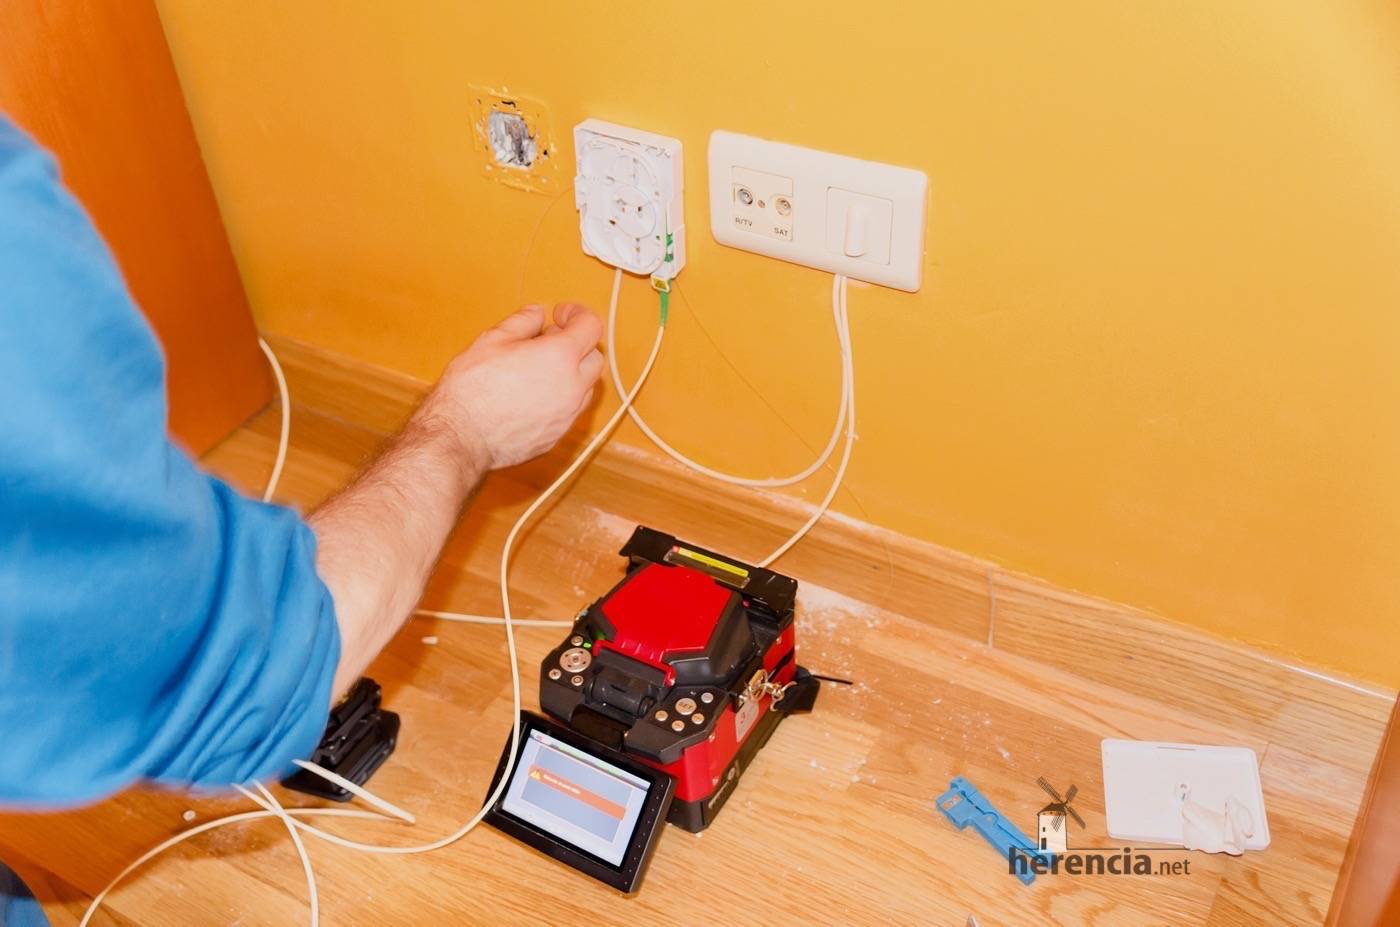 instalacion fibra optica en el hogar - Telefónica cerca de desplegar Fibra Óptica en Herencia